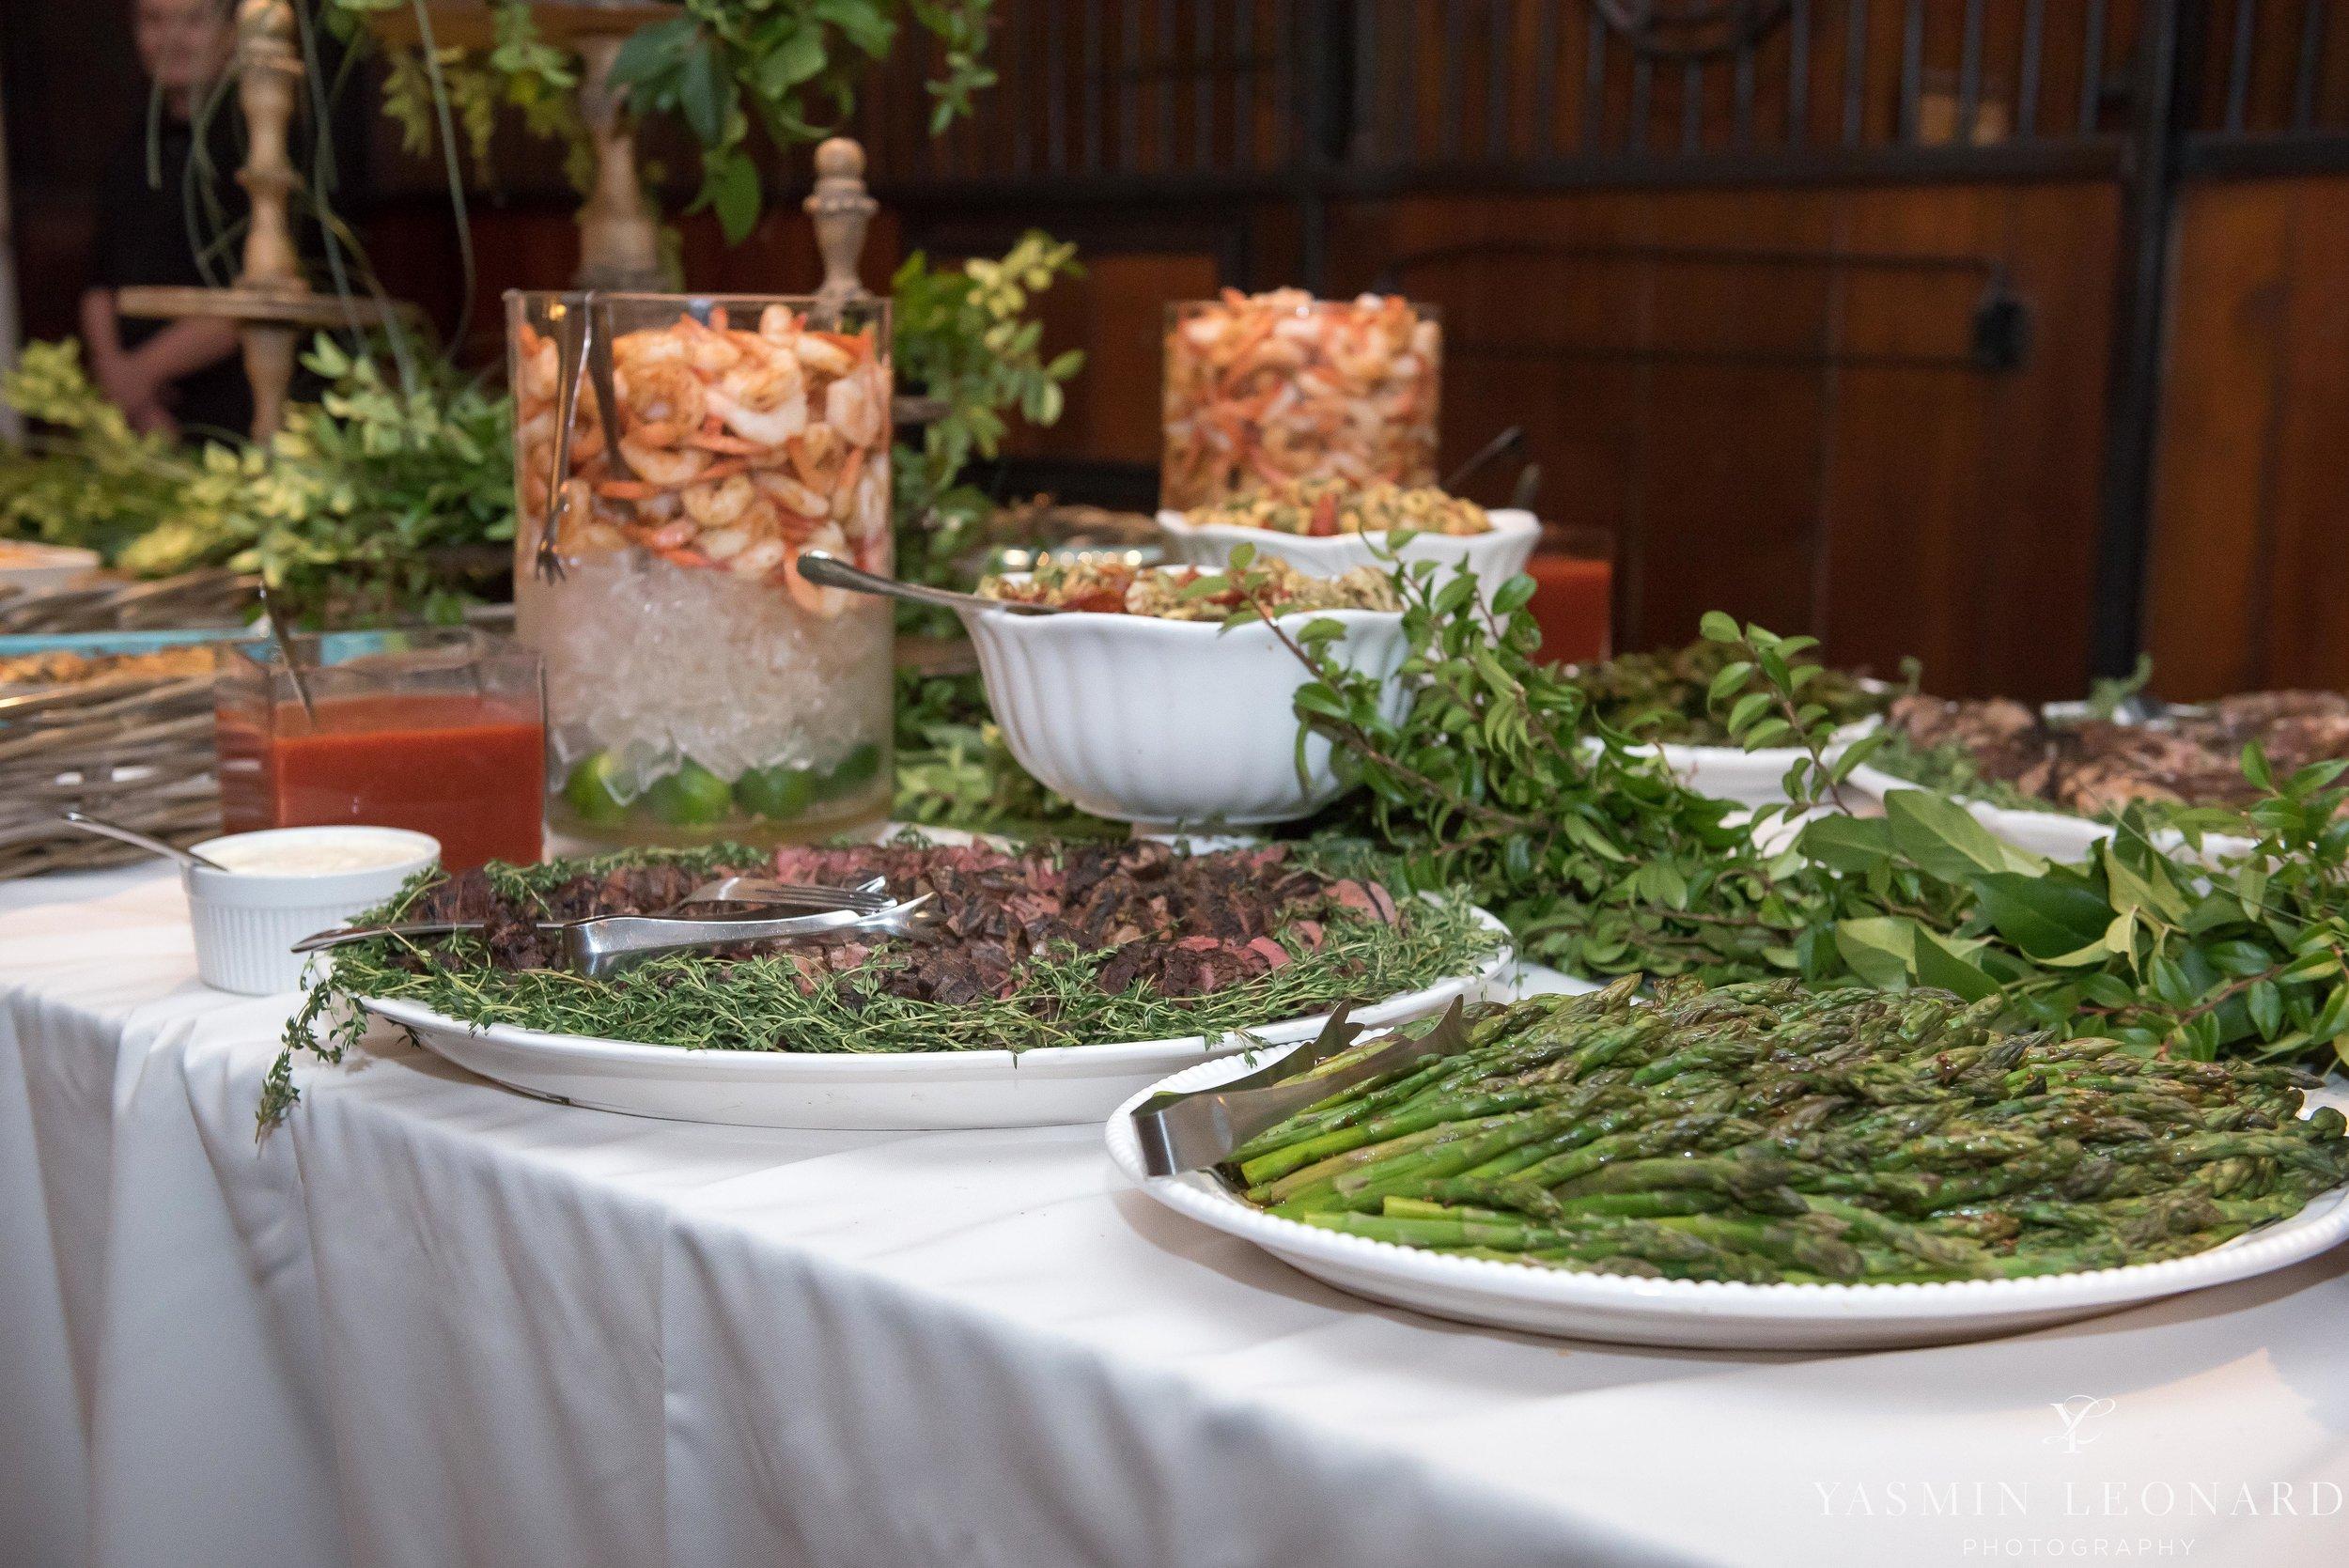 Adaumont Farm - Adaumont Farm Weddings - Trinity Weddings - NC Weddings - Yasmin Leonard Photography-58.jpg